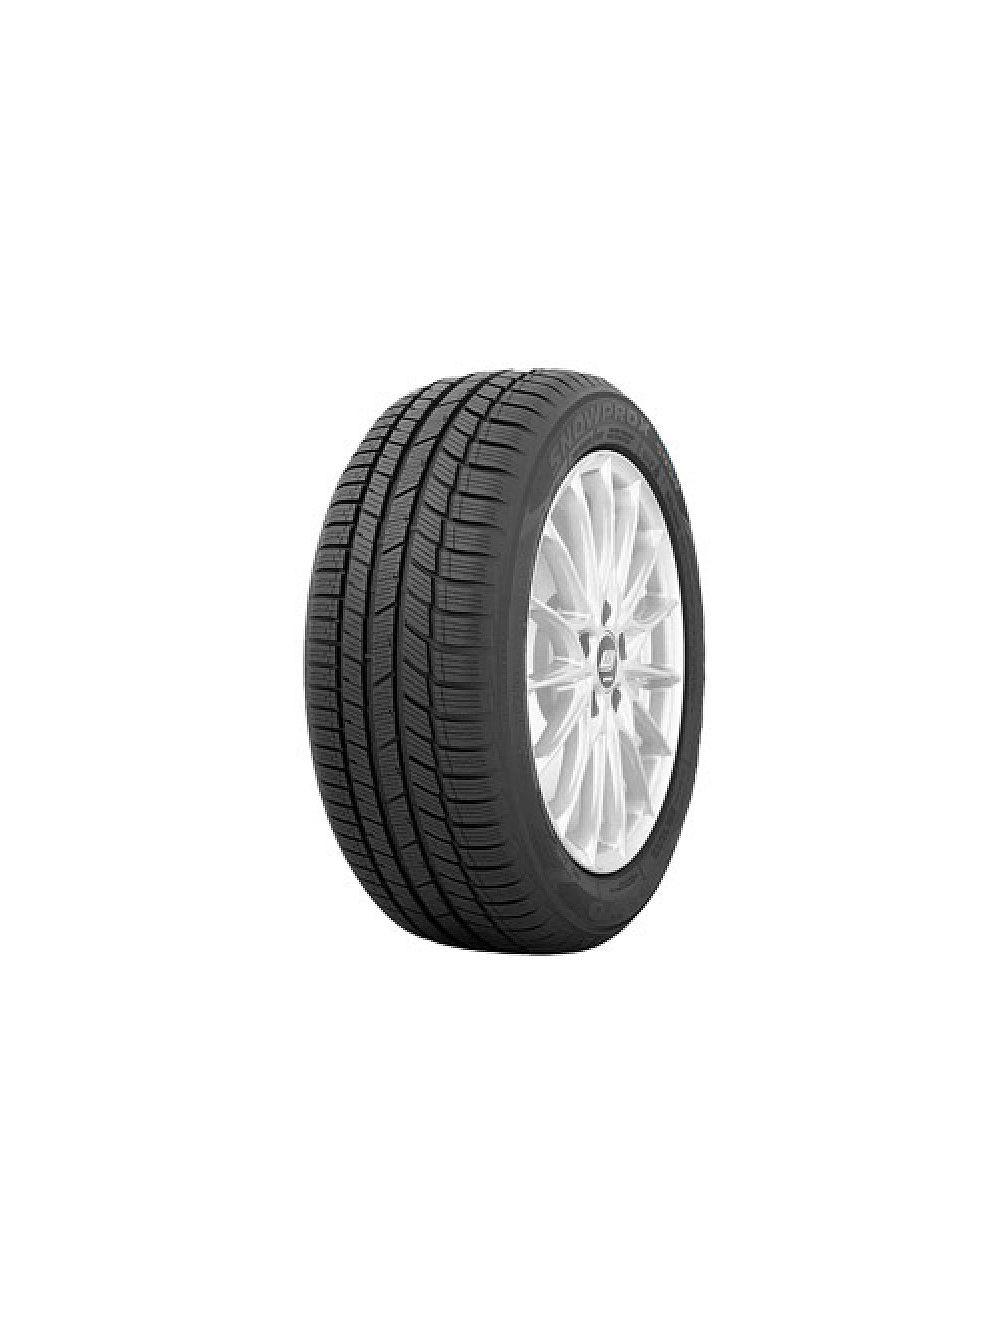 Toyo 275/45R20 V S954 Snowprox SUV XL Téli gumi